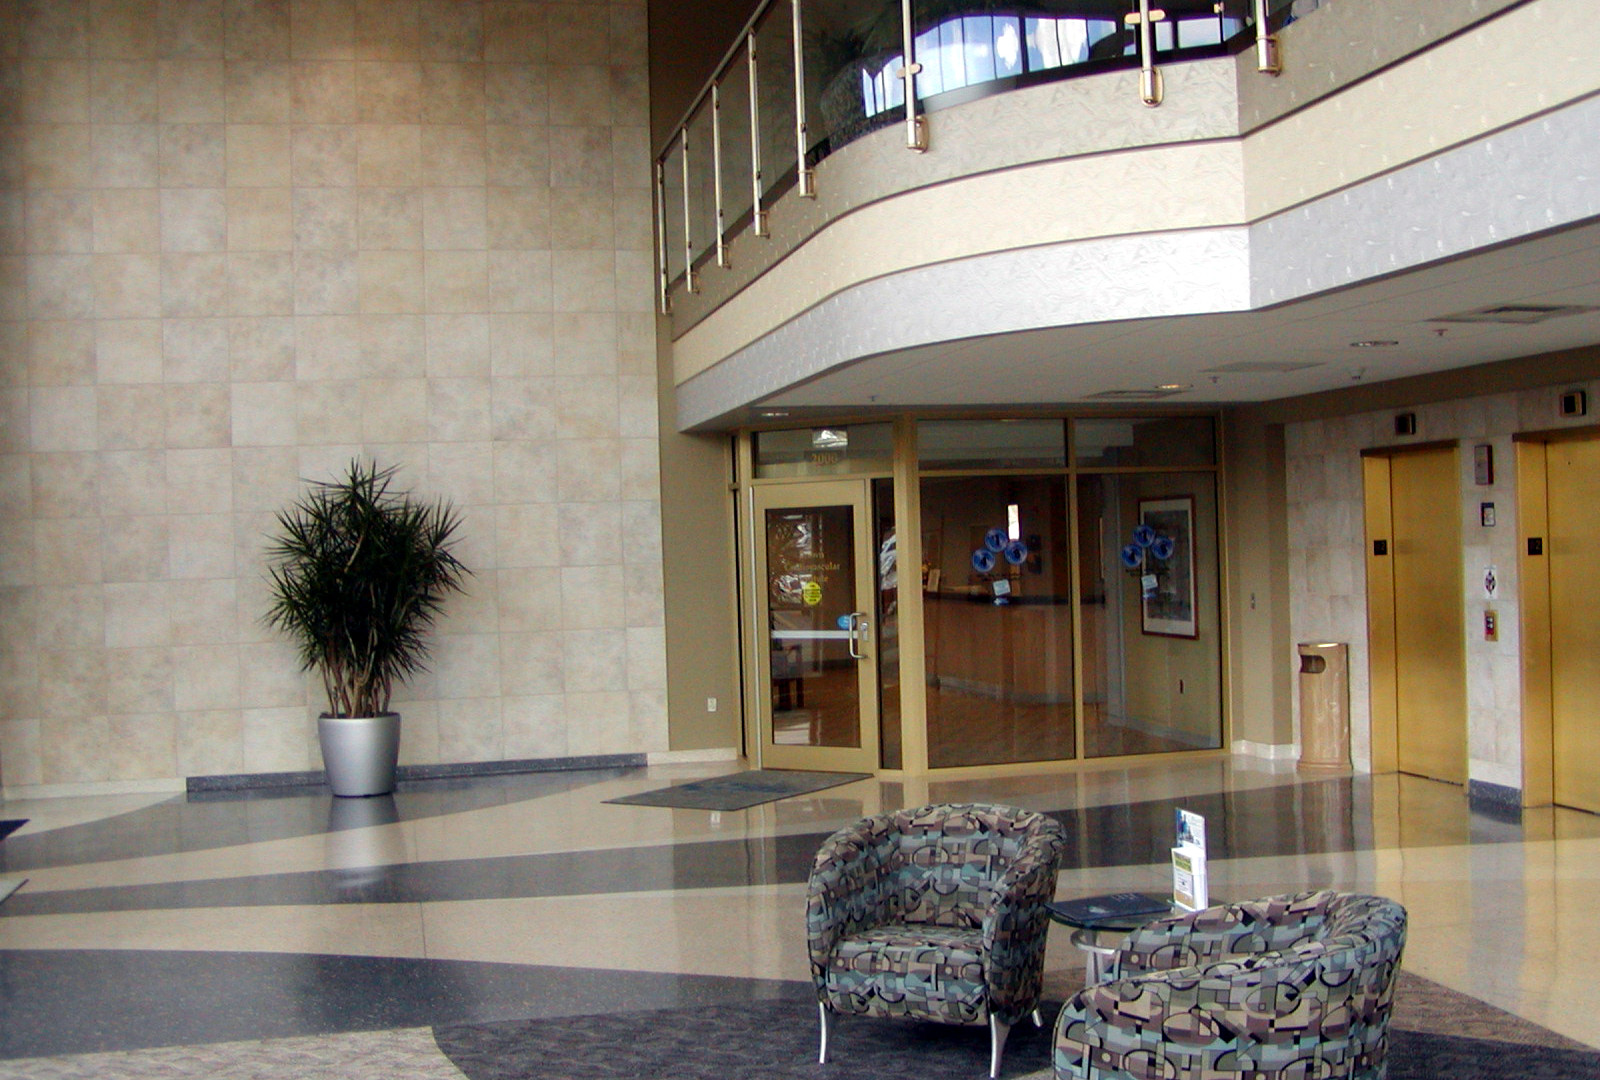 Silver Cross Medical Pavilion